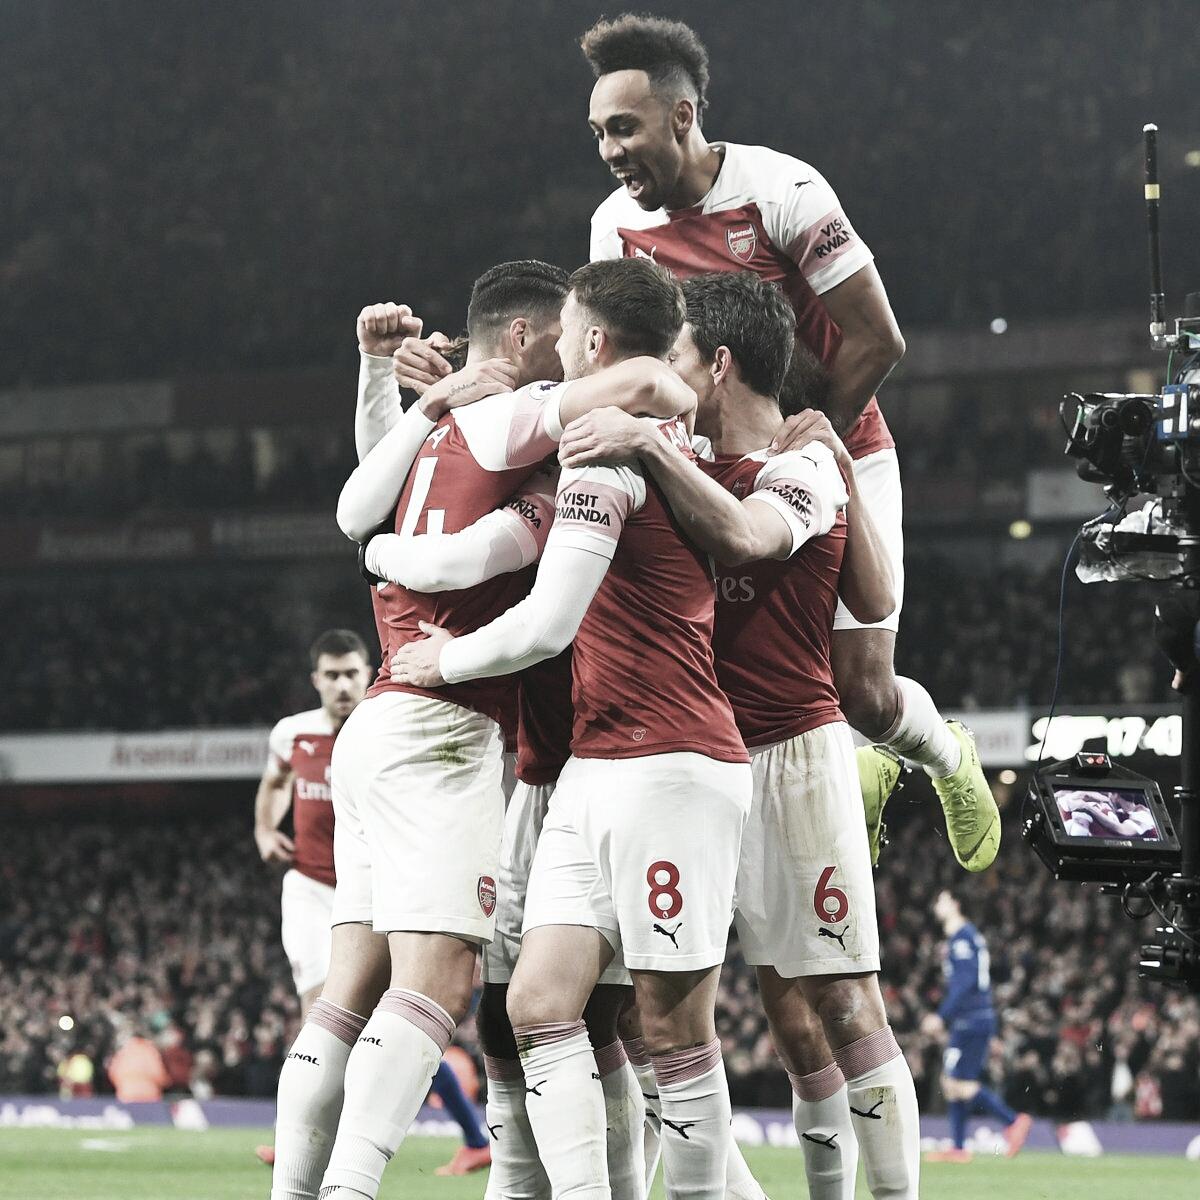 Arsenal vence Chelsea e se aproxima do Top 4 da Premier League